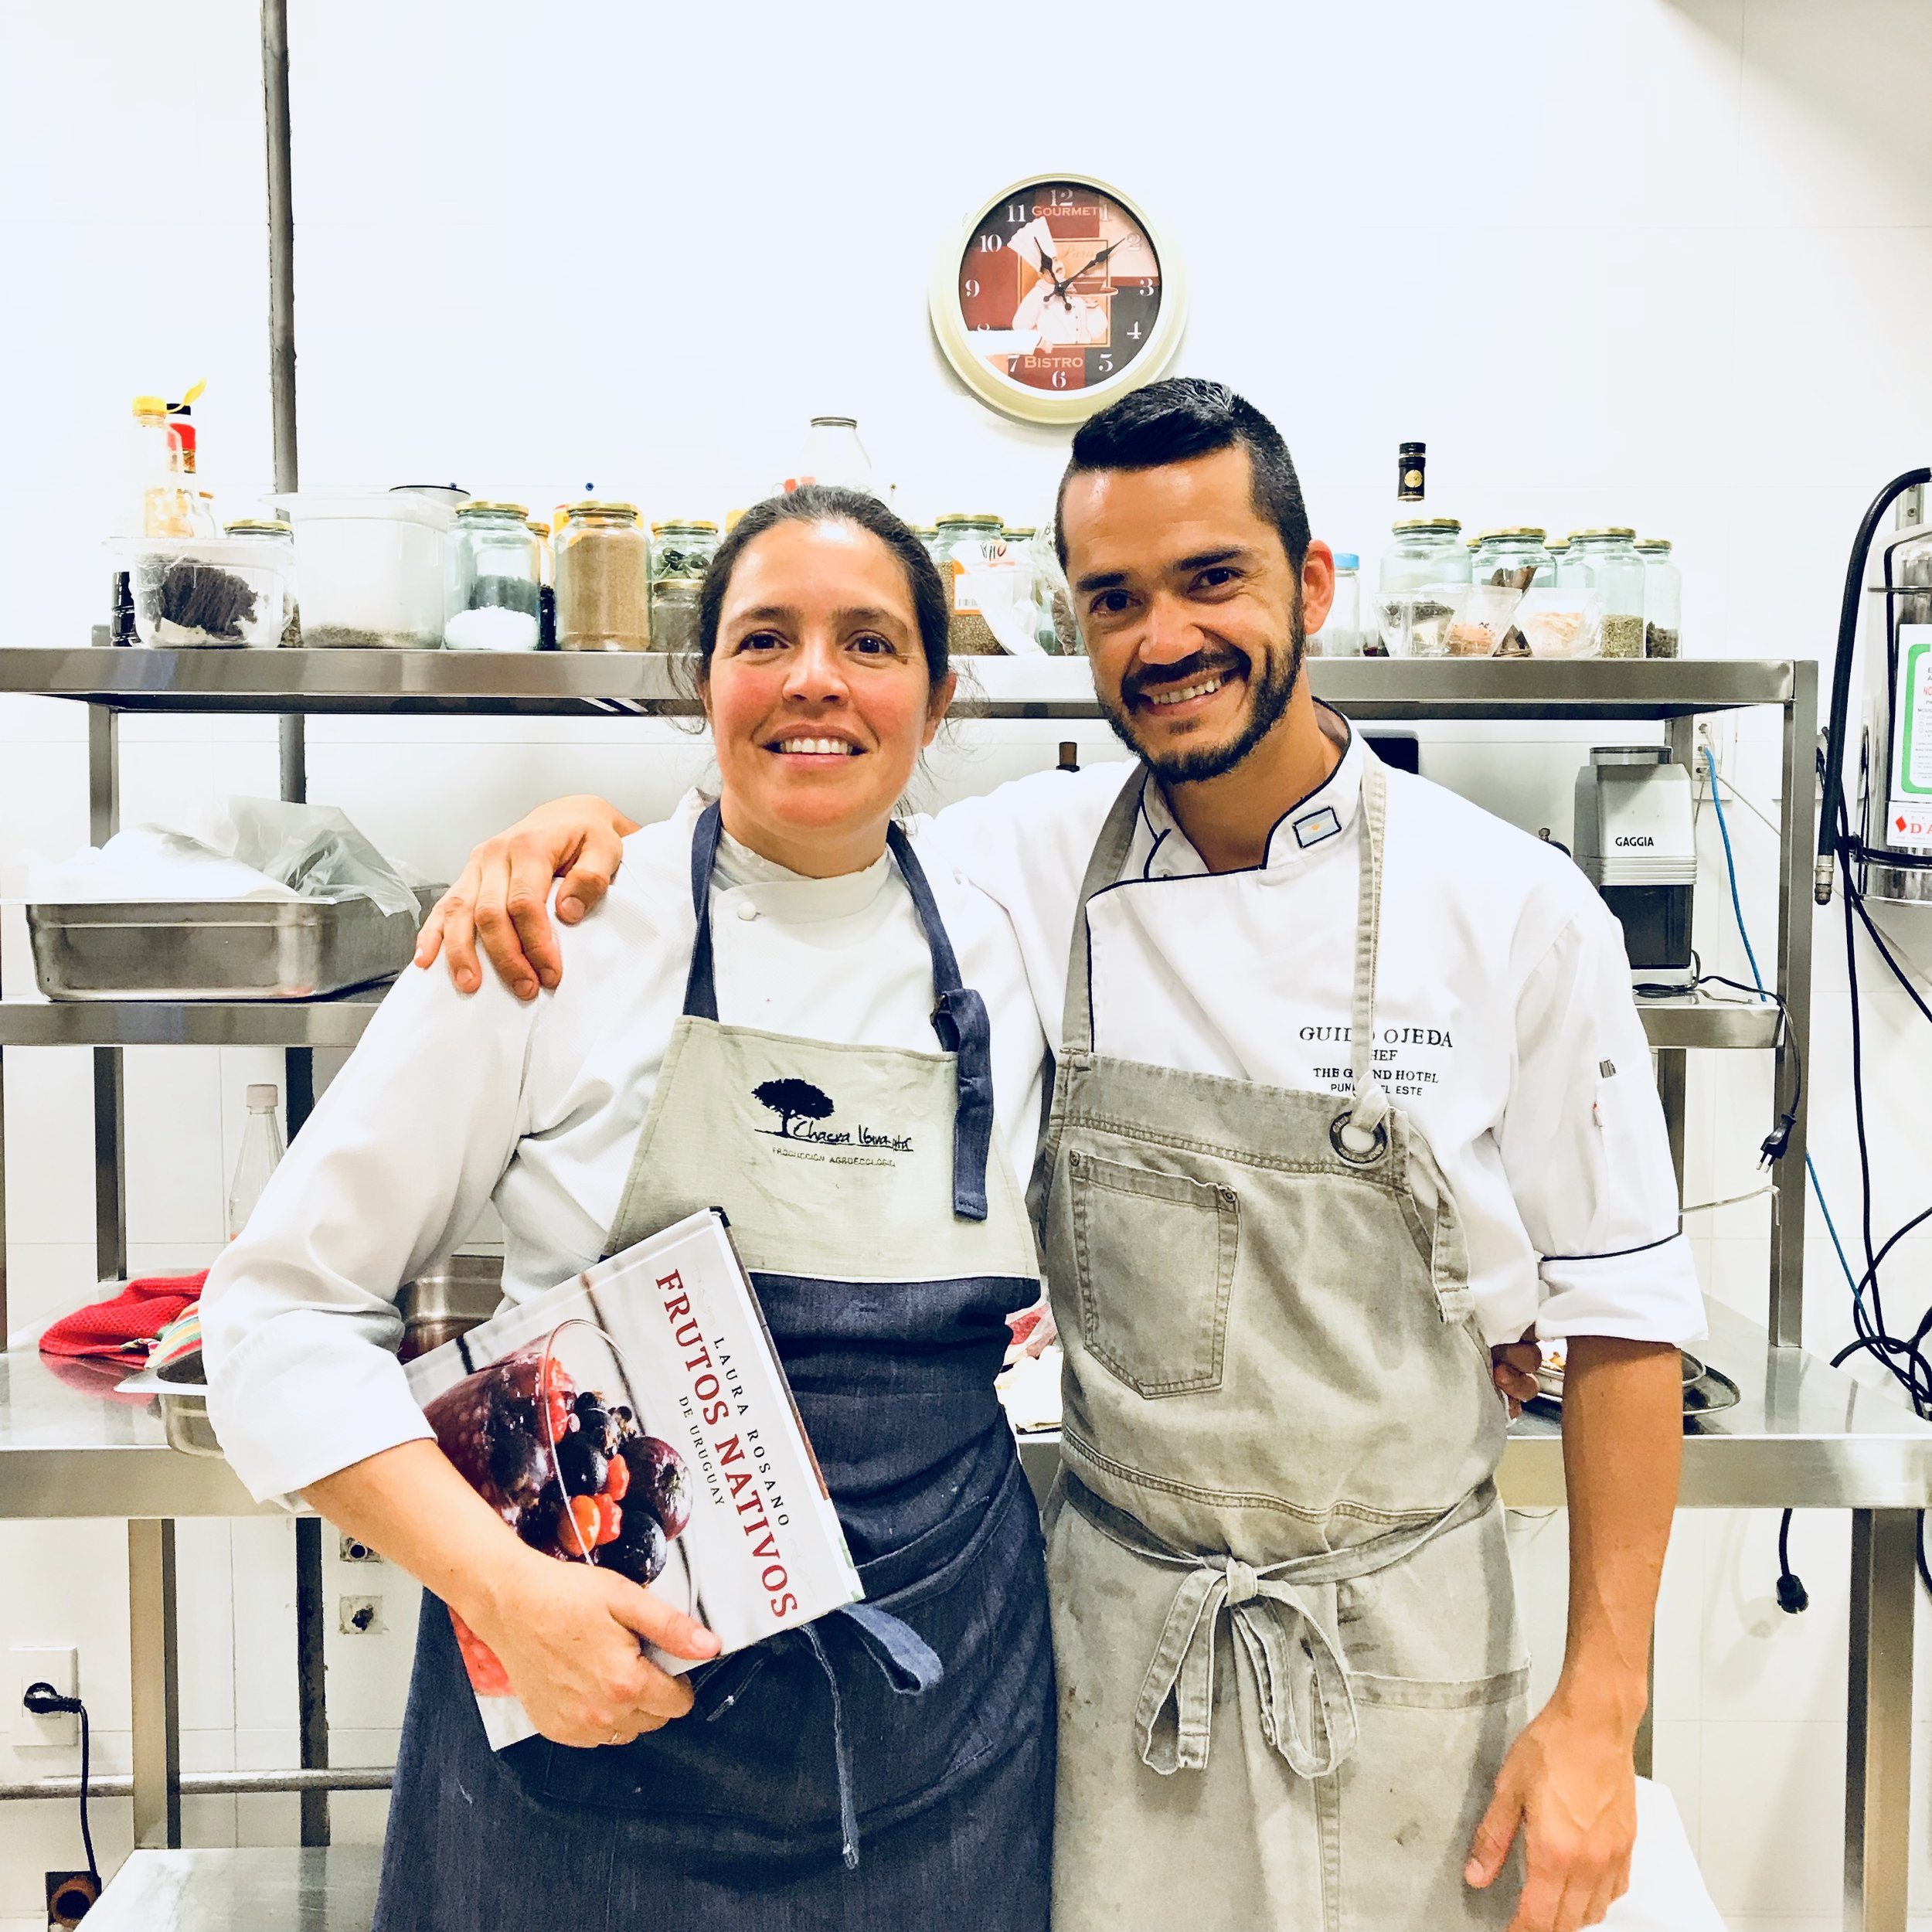 Chefs Laura Rosano y Guido Ojeda